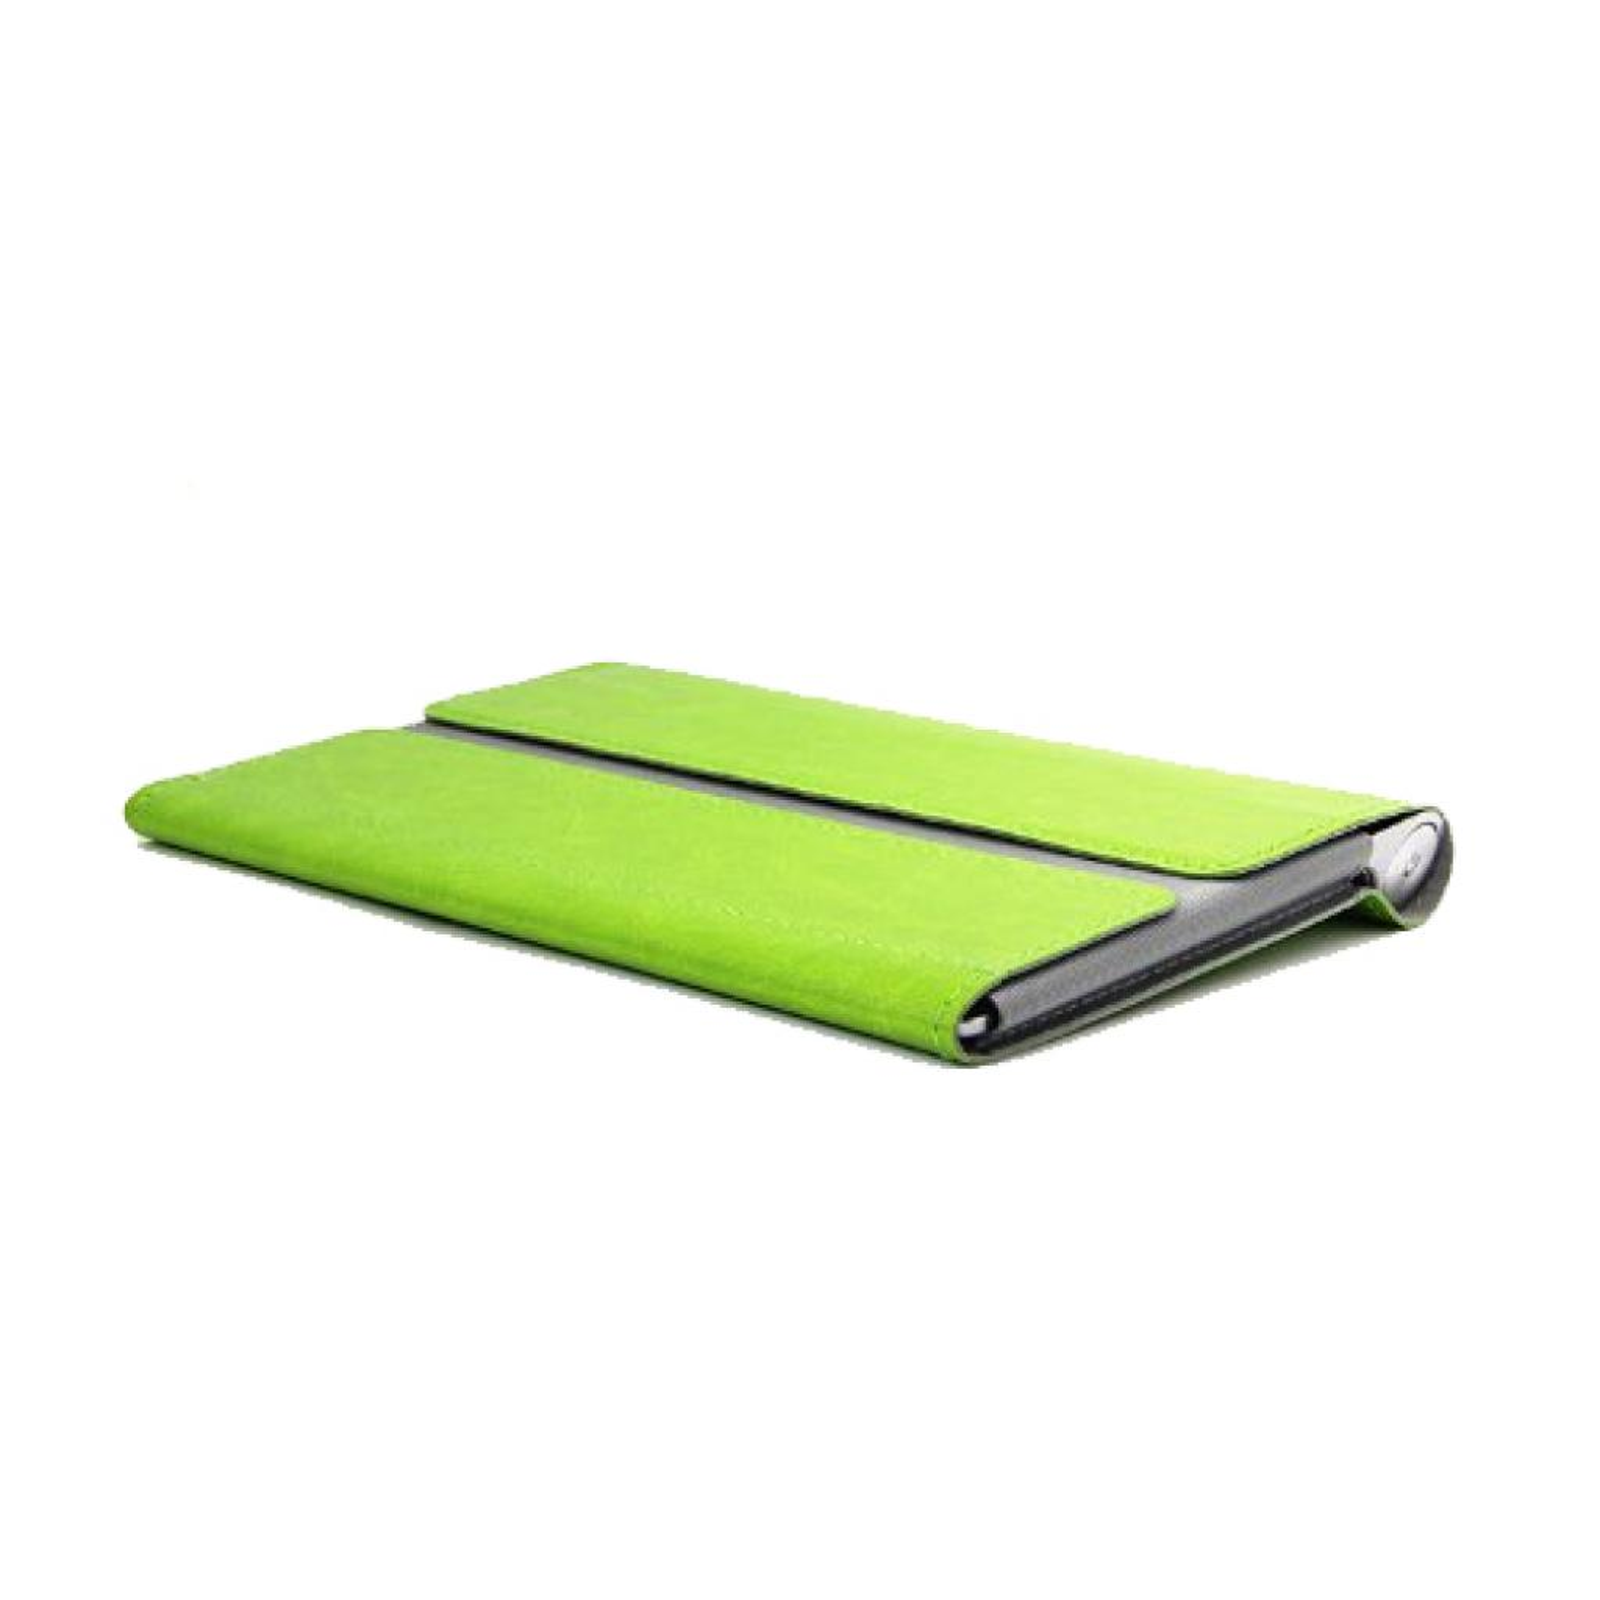 Чехол для планшета Lenovo 10' B8000 Yoga Tablet, Sleeve and Film Green (888016011) изображение 2